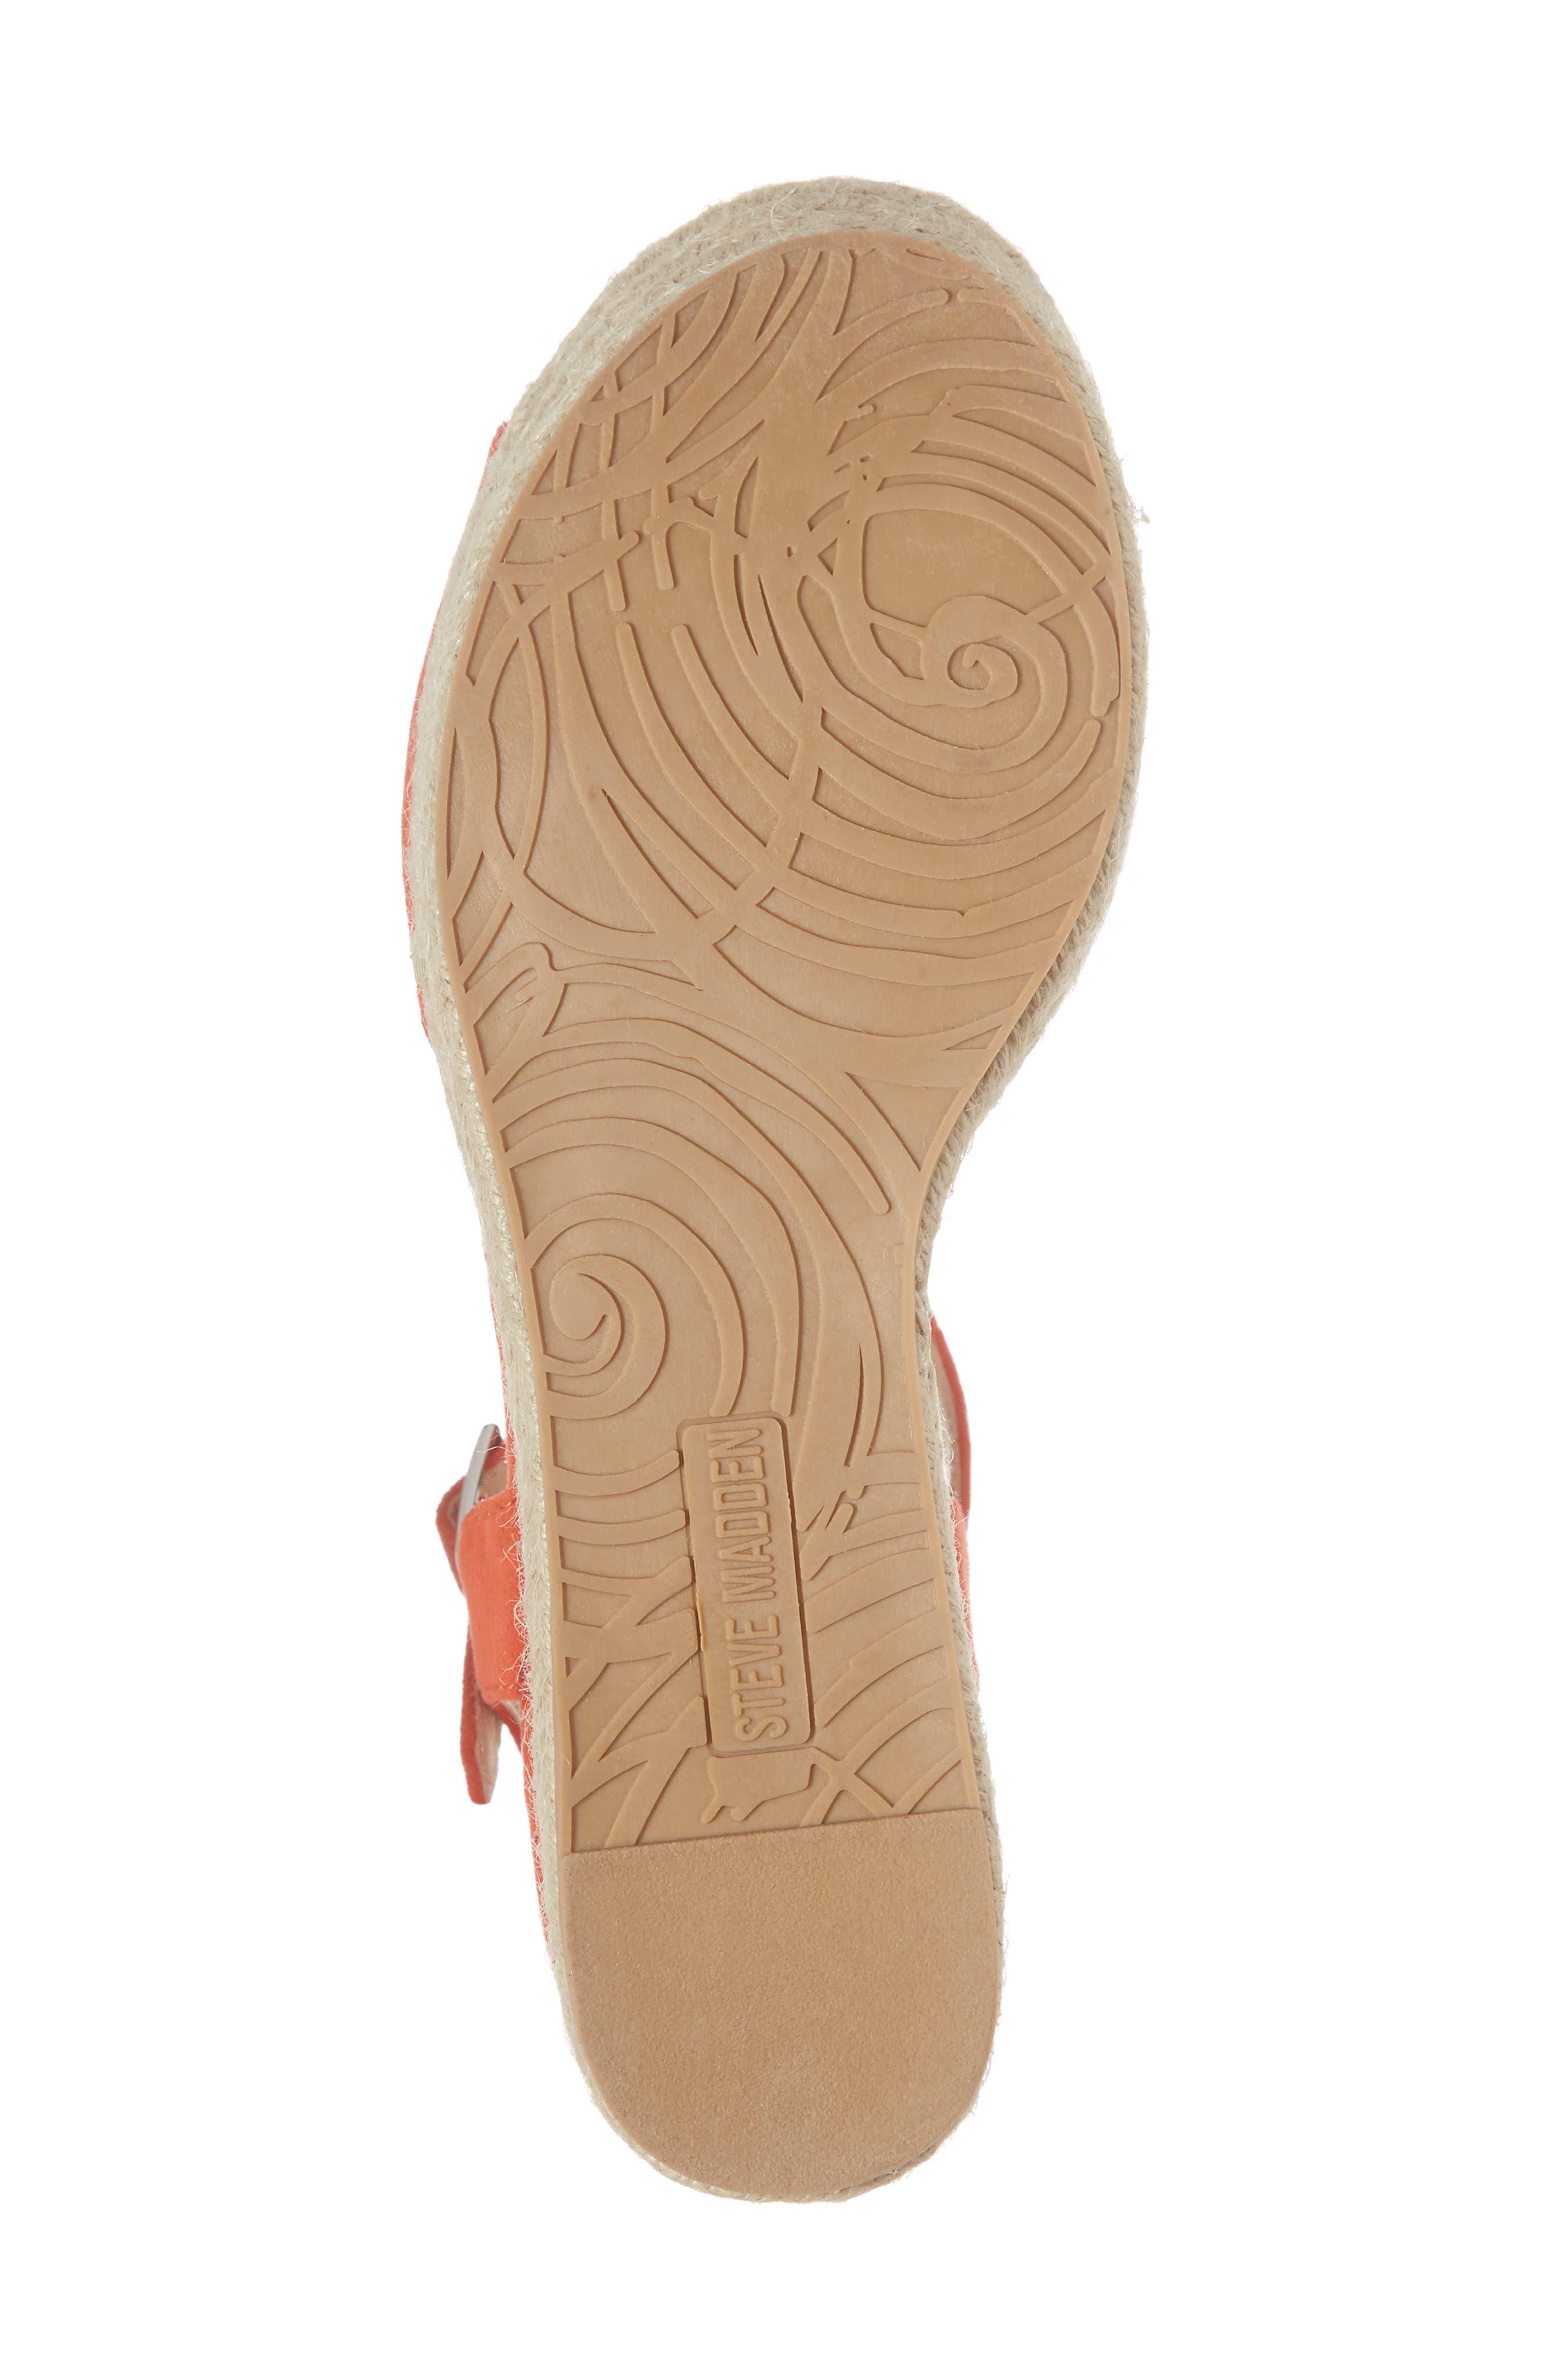 Kianna Espadrille Wedge Sandal,                             Alternate thumbnail 6, color,                             CORAL SUEDE